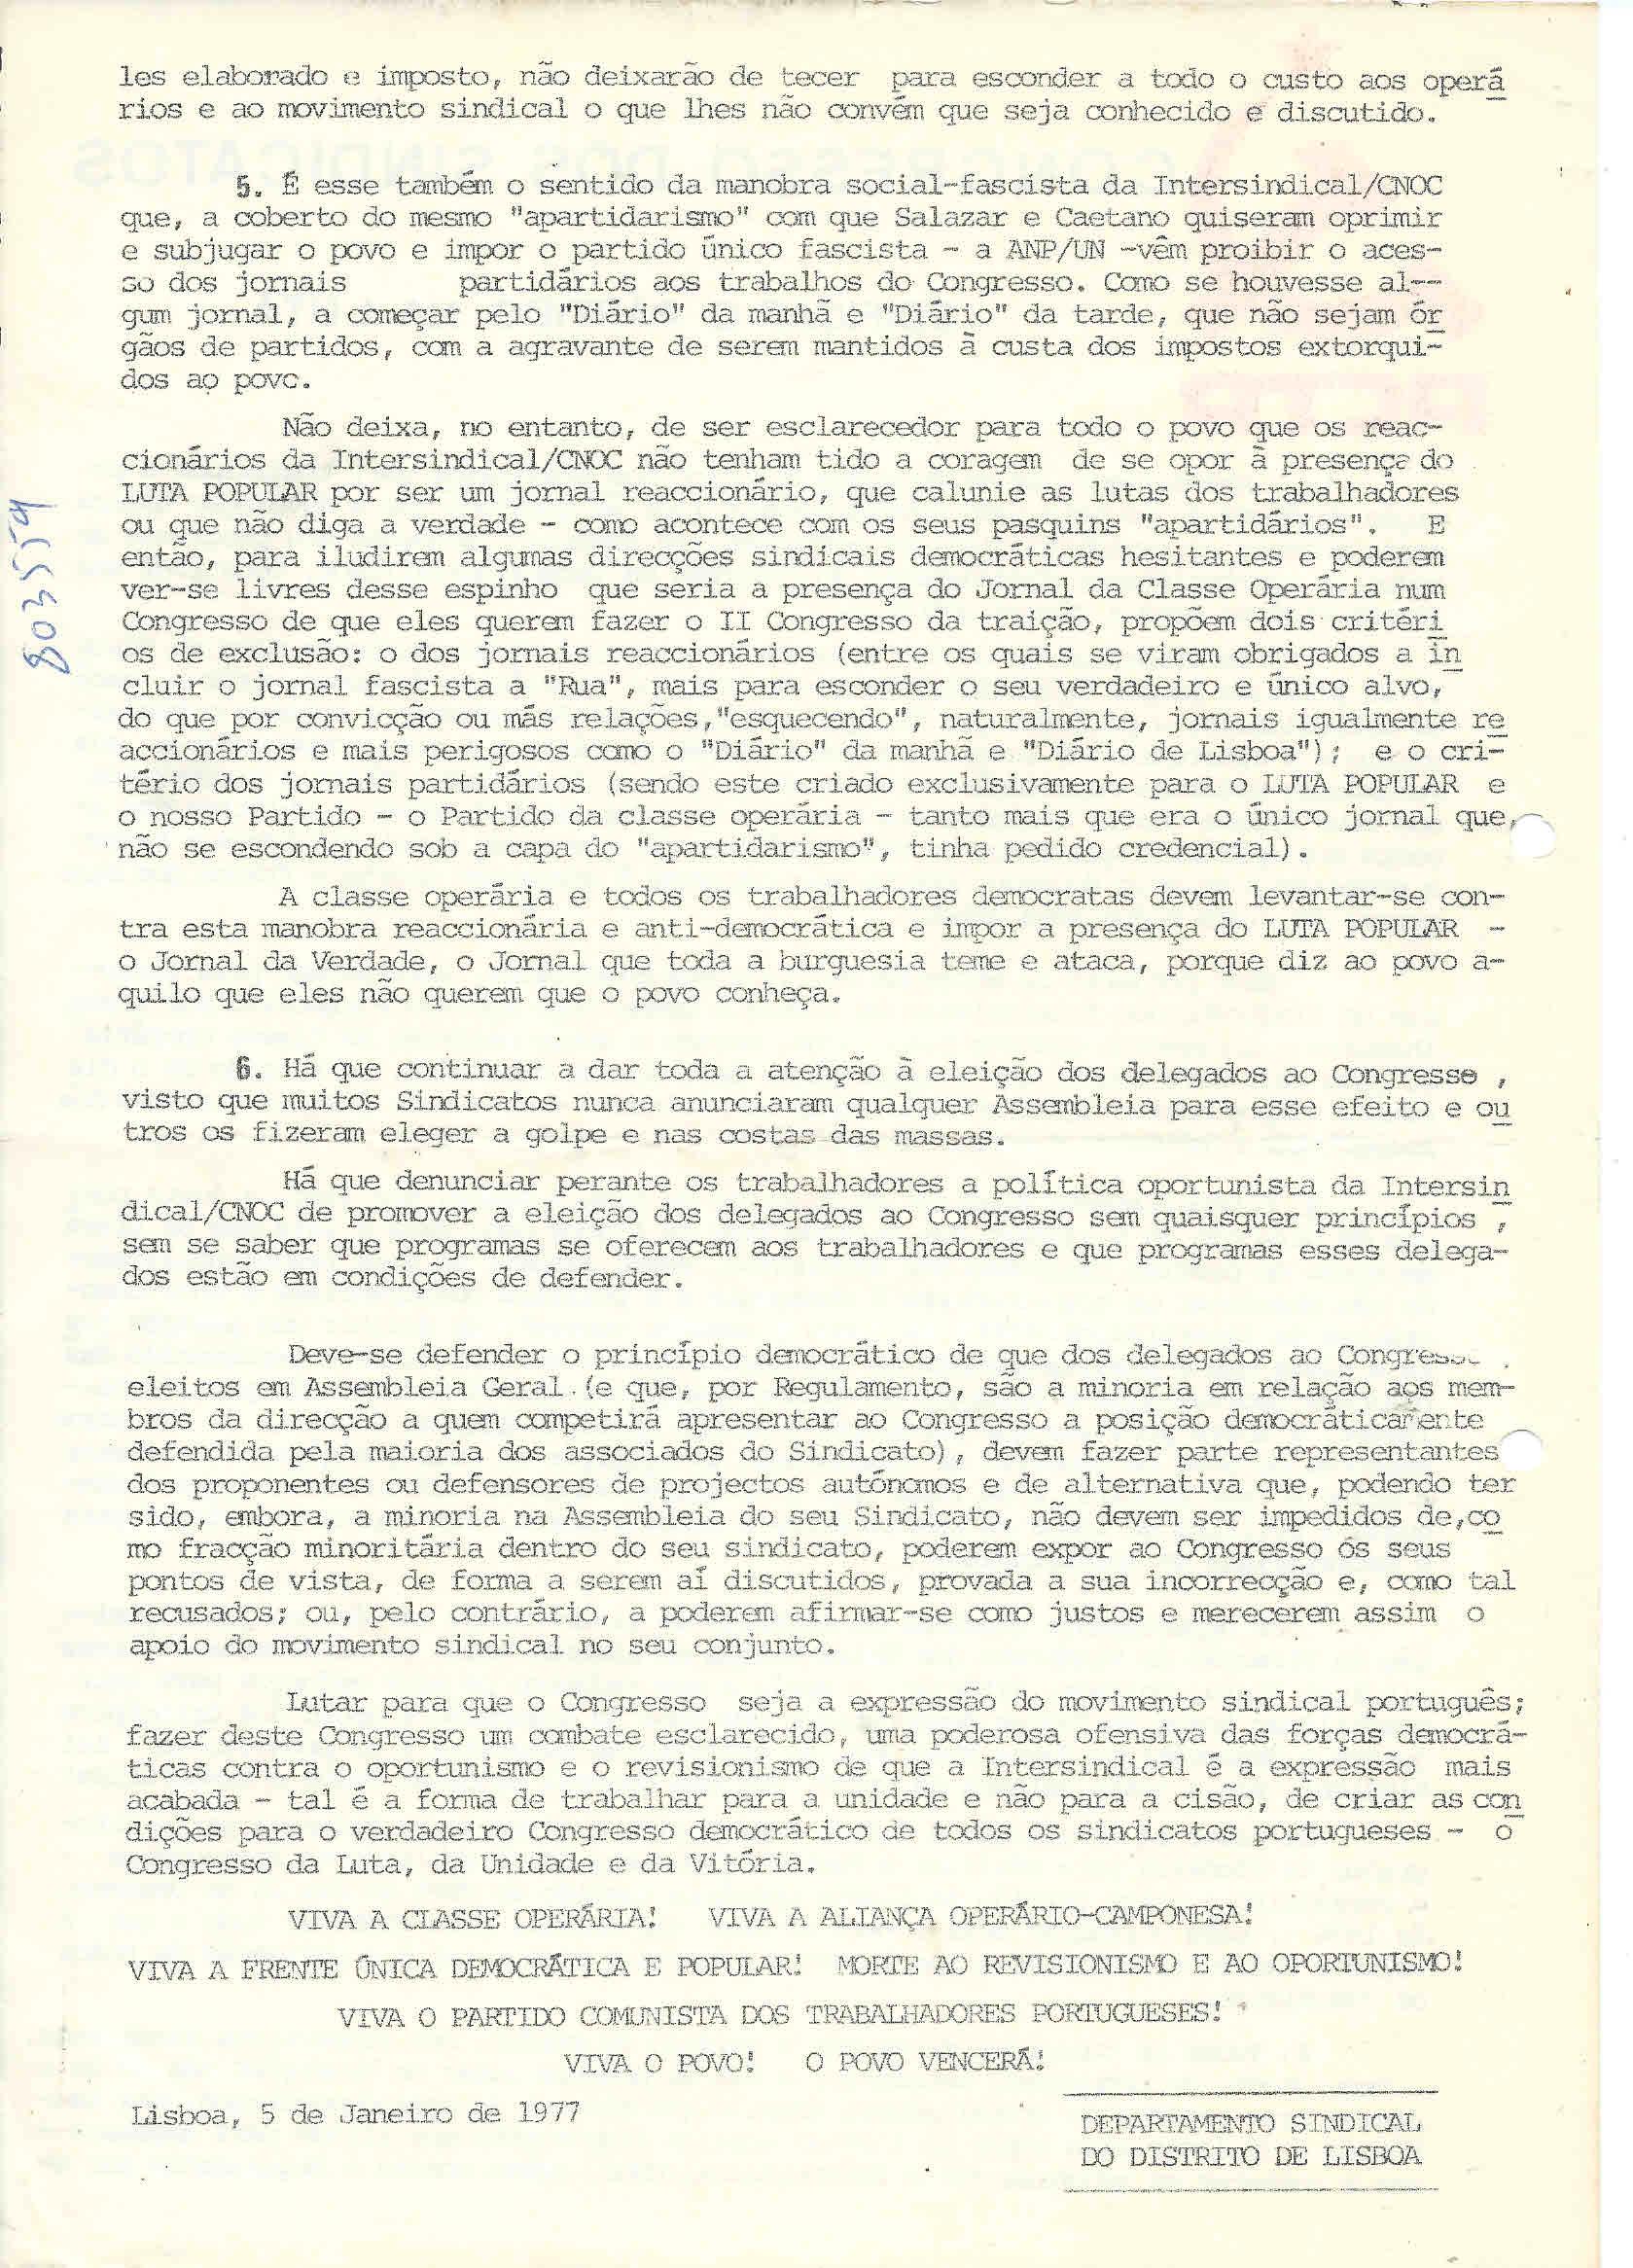 pctp congresso dos sindicatos (2)